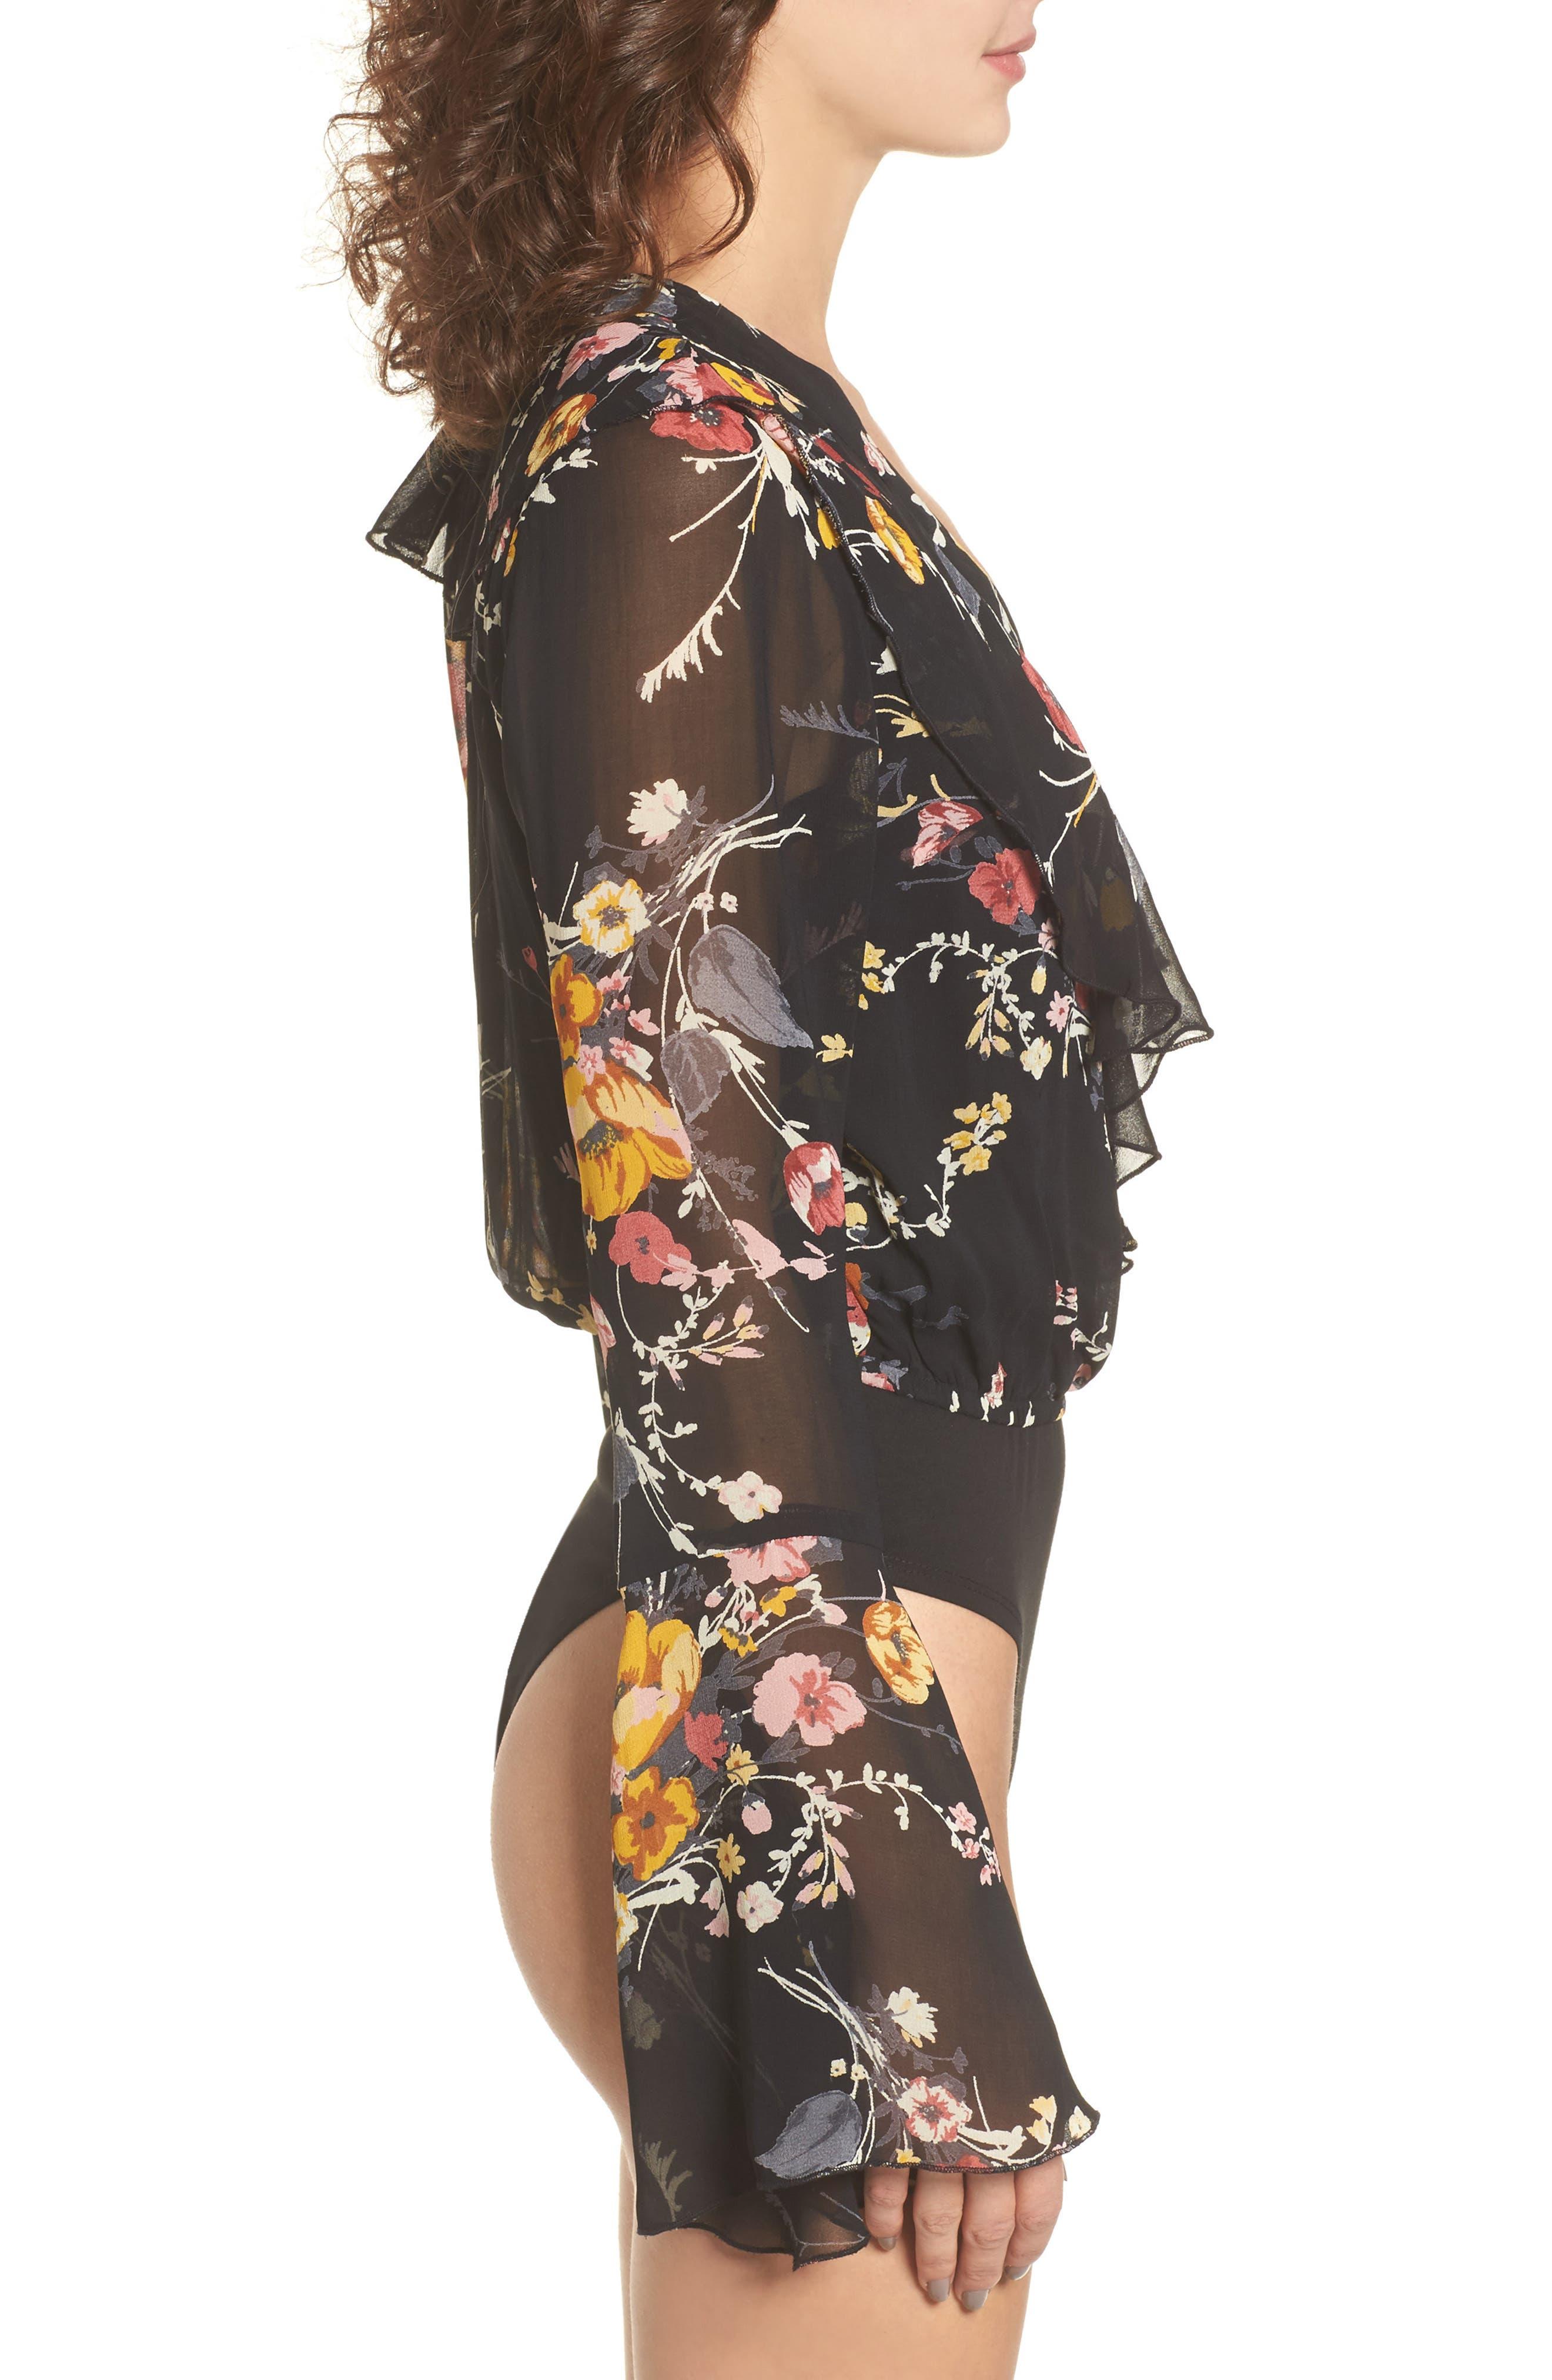 Floral Ruffle Bodysuit,                             Alternate thumbnail 4, color,                             Black/ Mustard